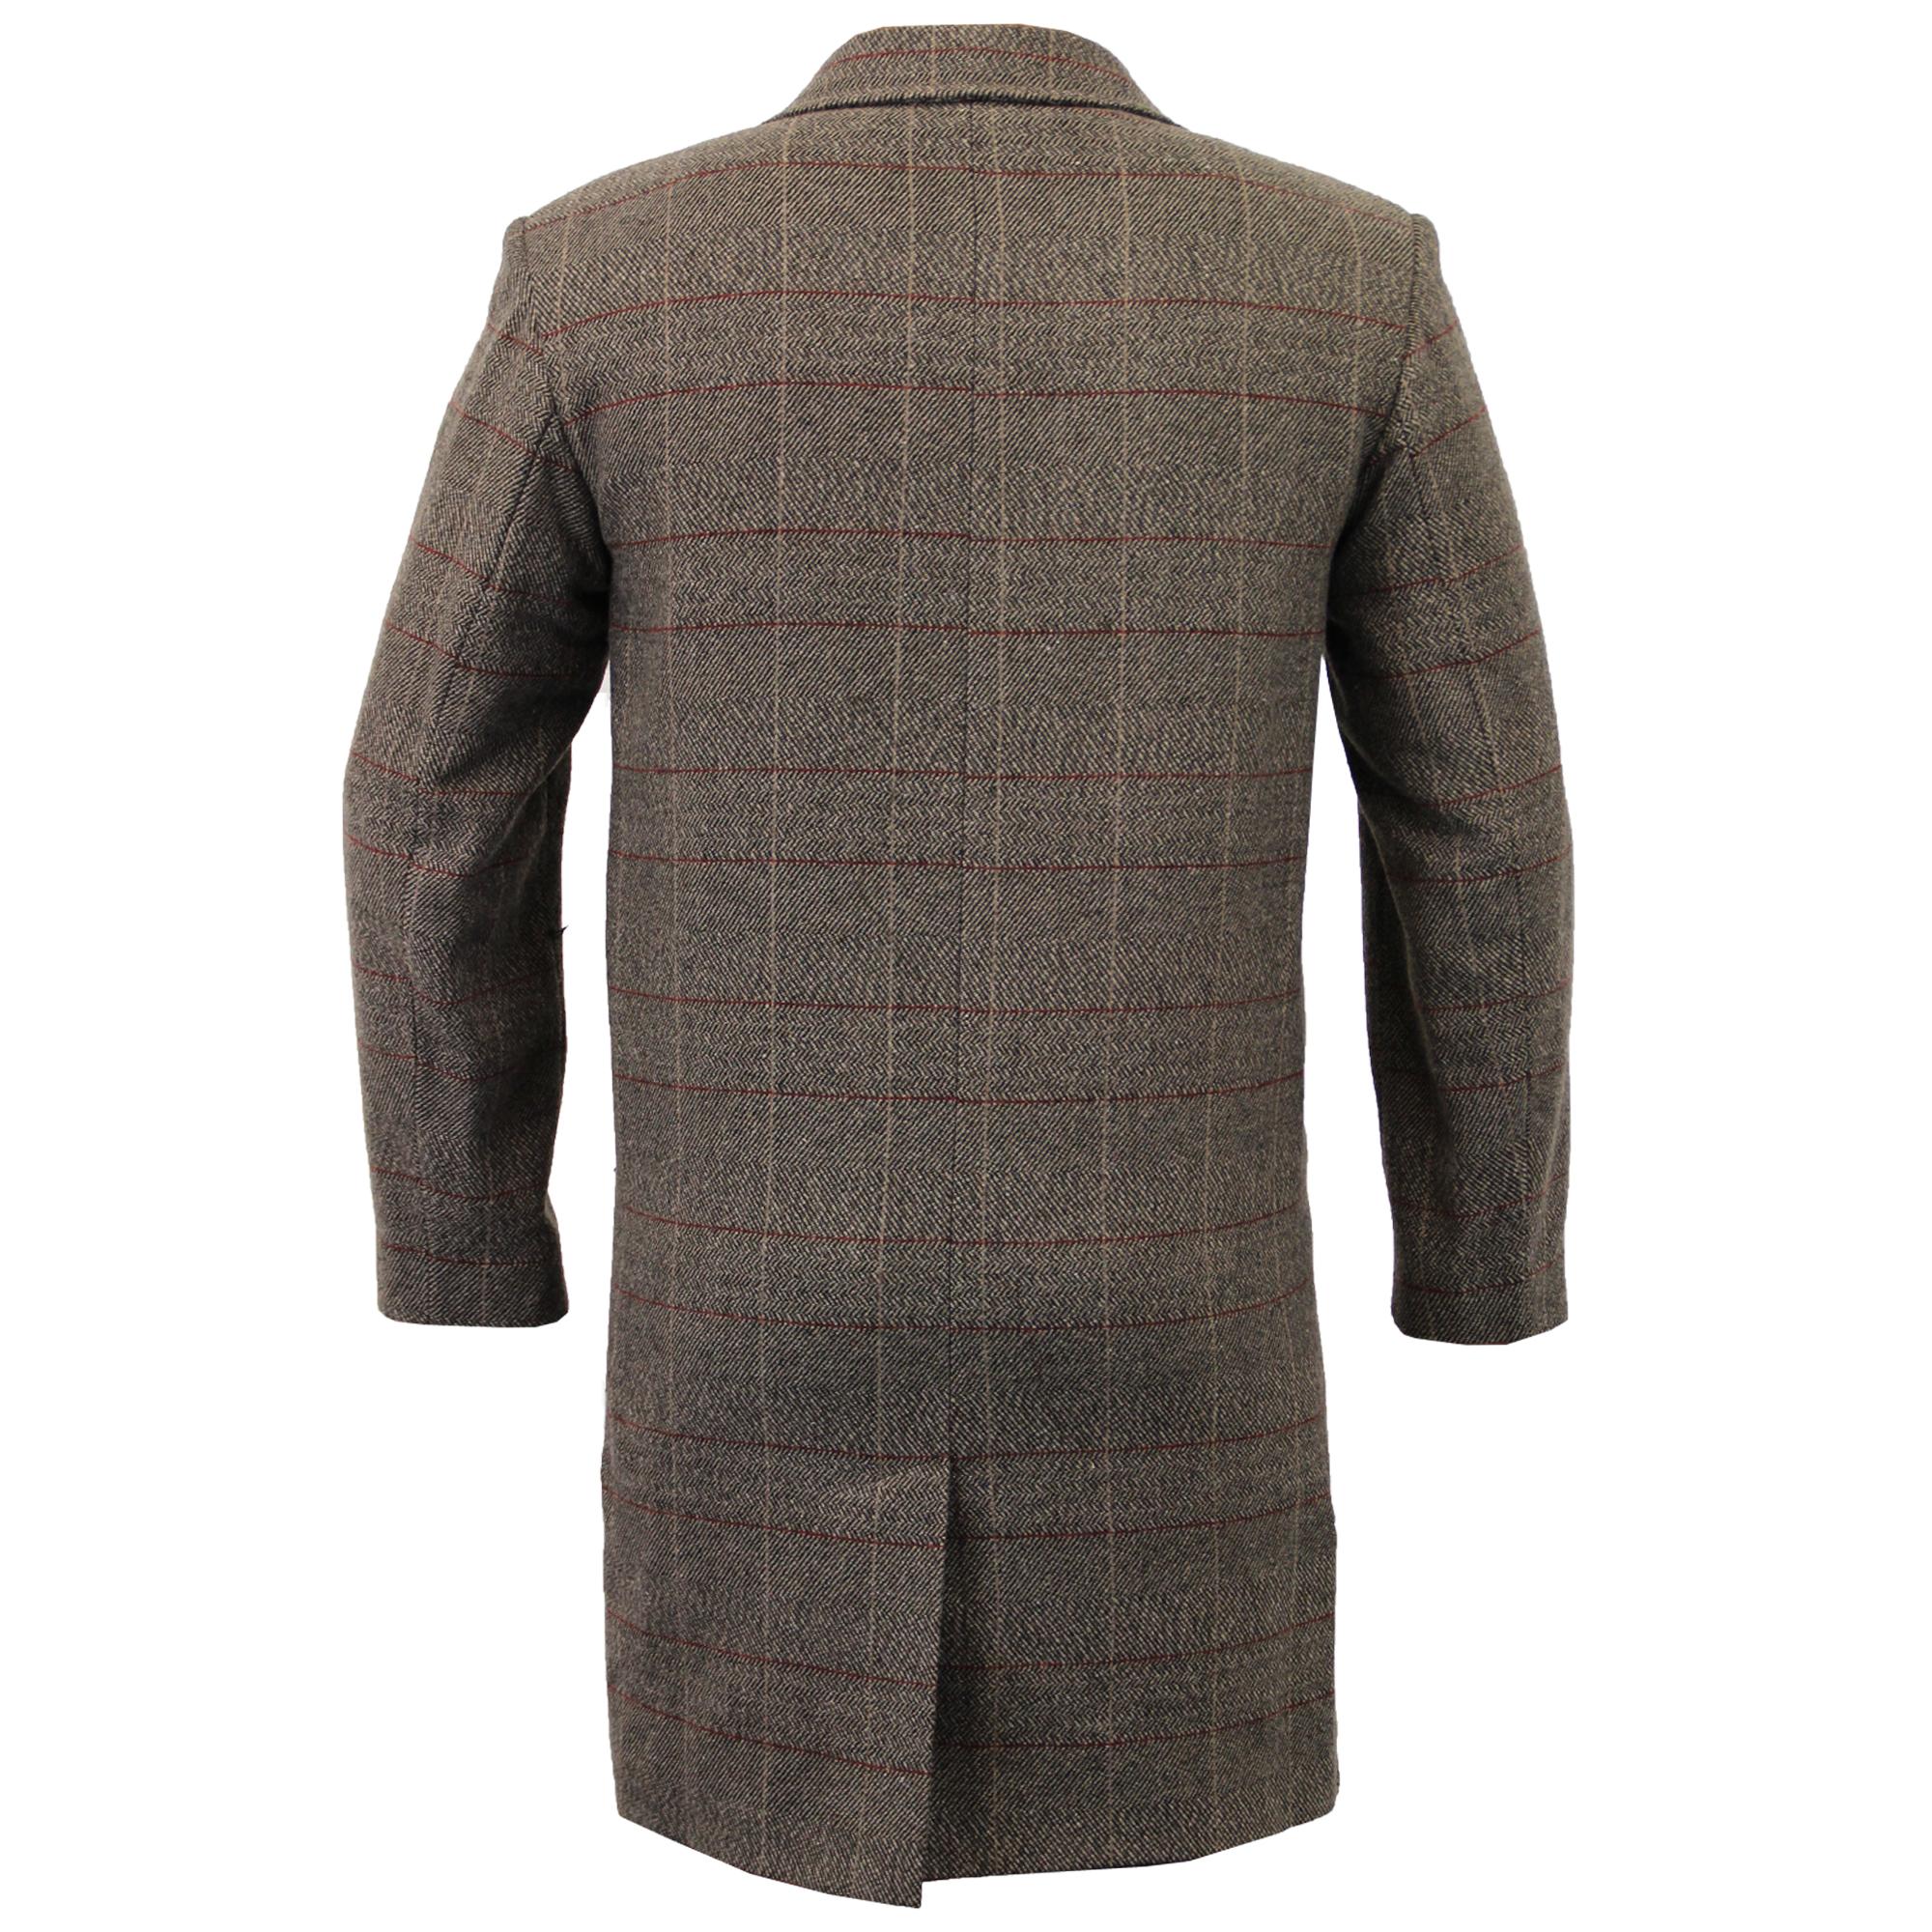 Mens-Wool-Mix-Trench-Coat-Checked-Long-Jacket-Herringbone-Tweed-Overcoat-Lined thumbnail 4